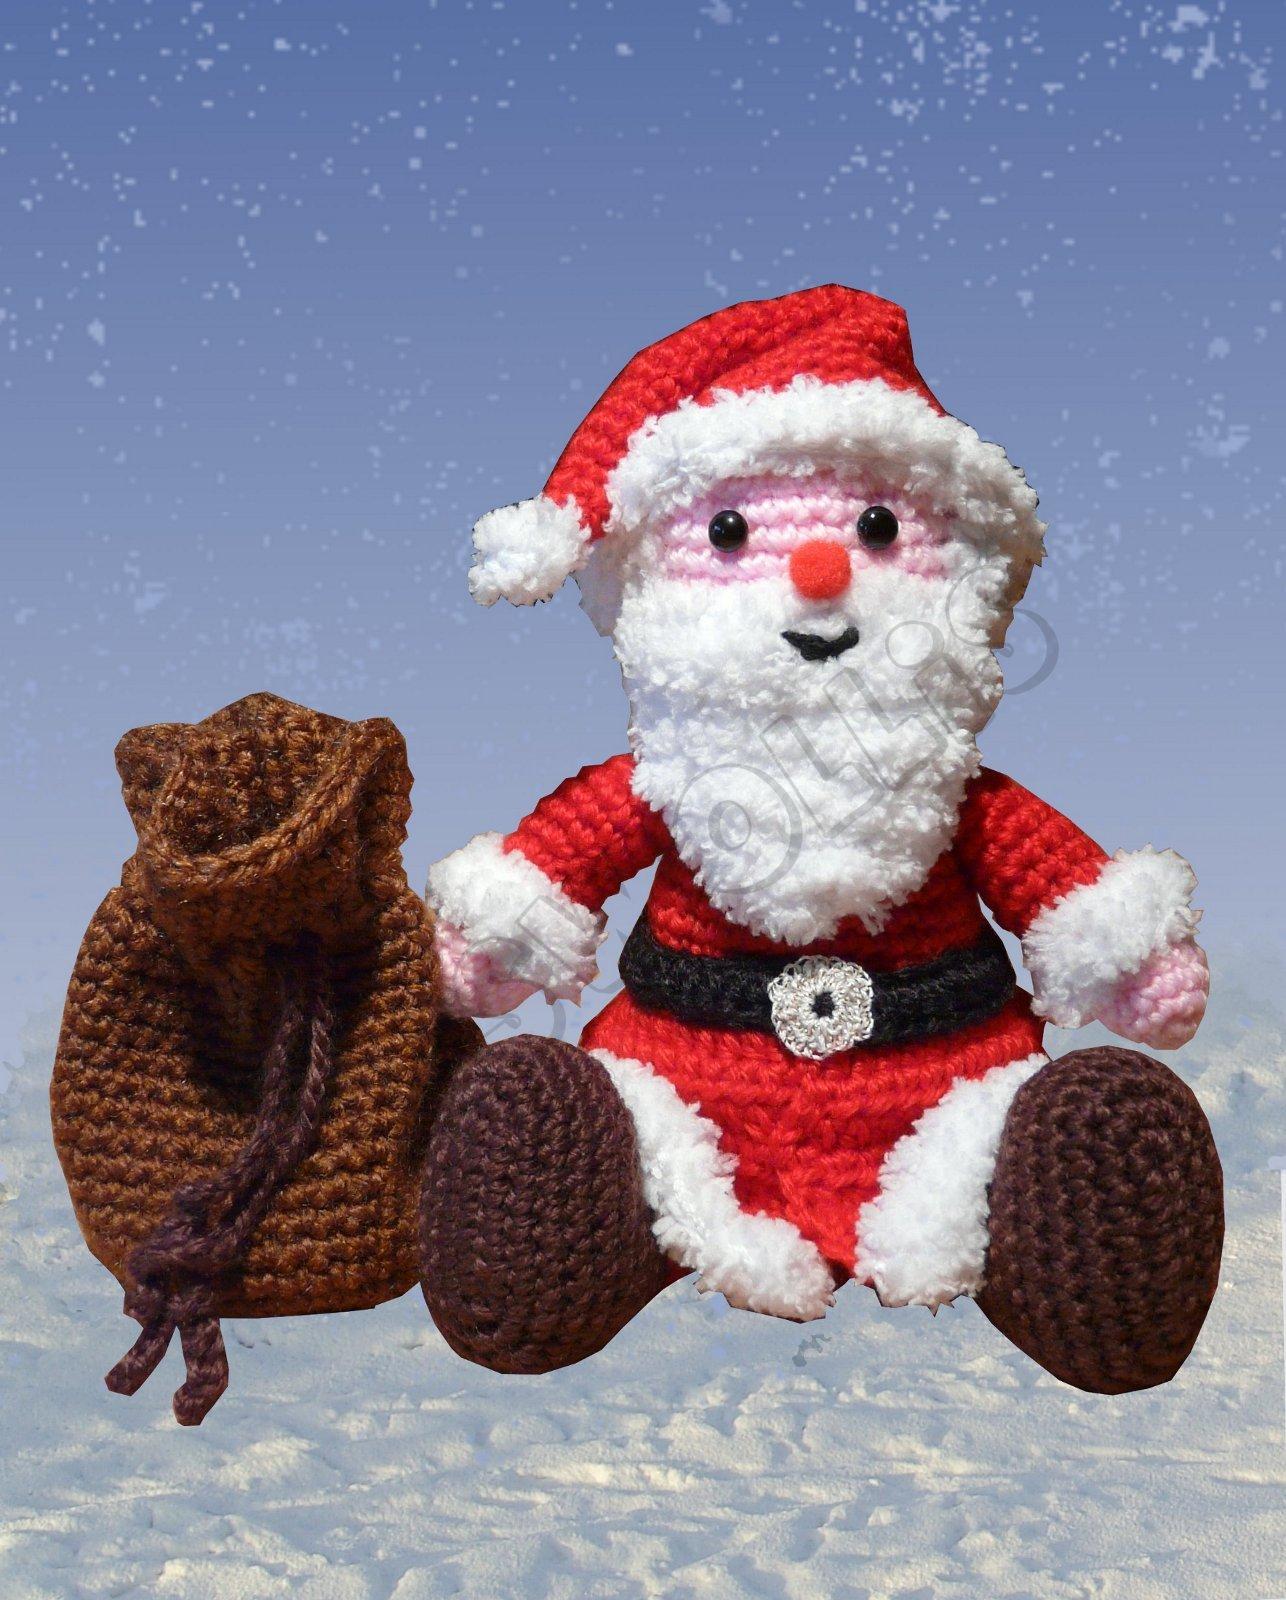 Häkeln mit RolisWollis › Amigurumi Weihnachtsmann